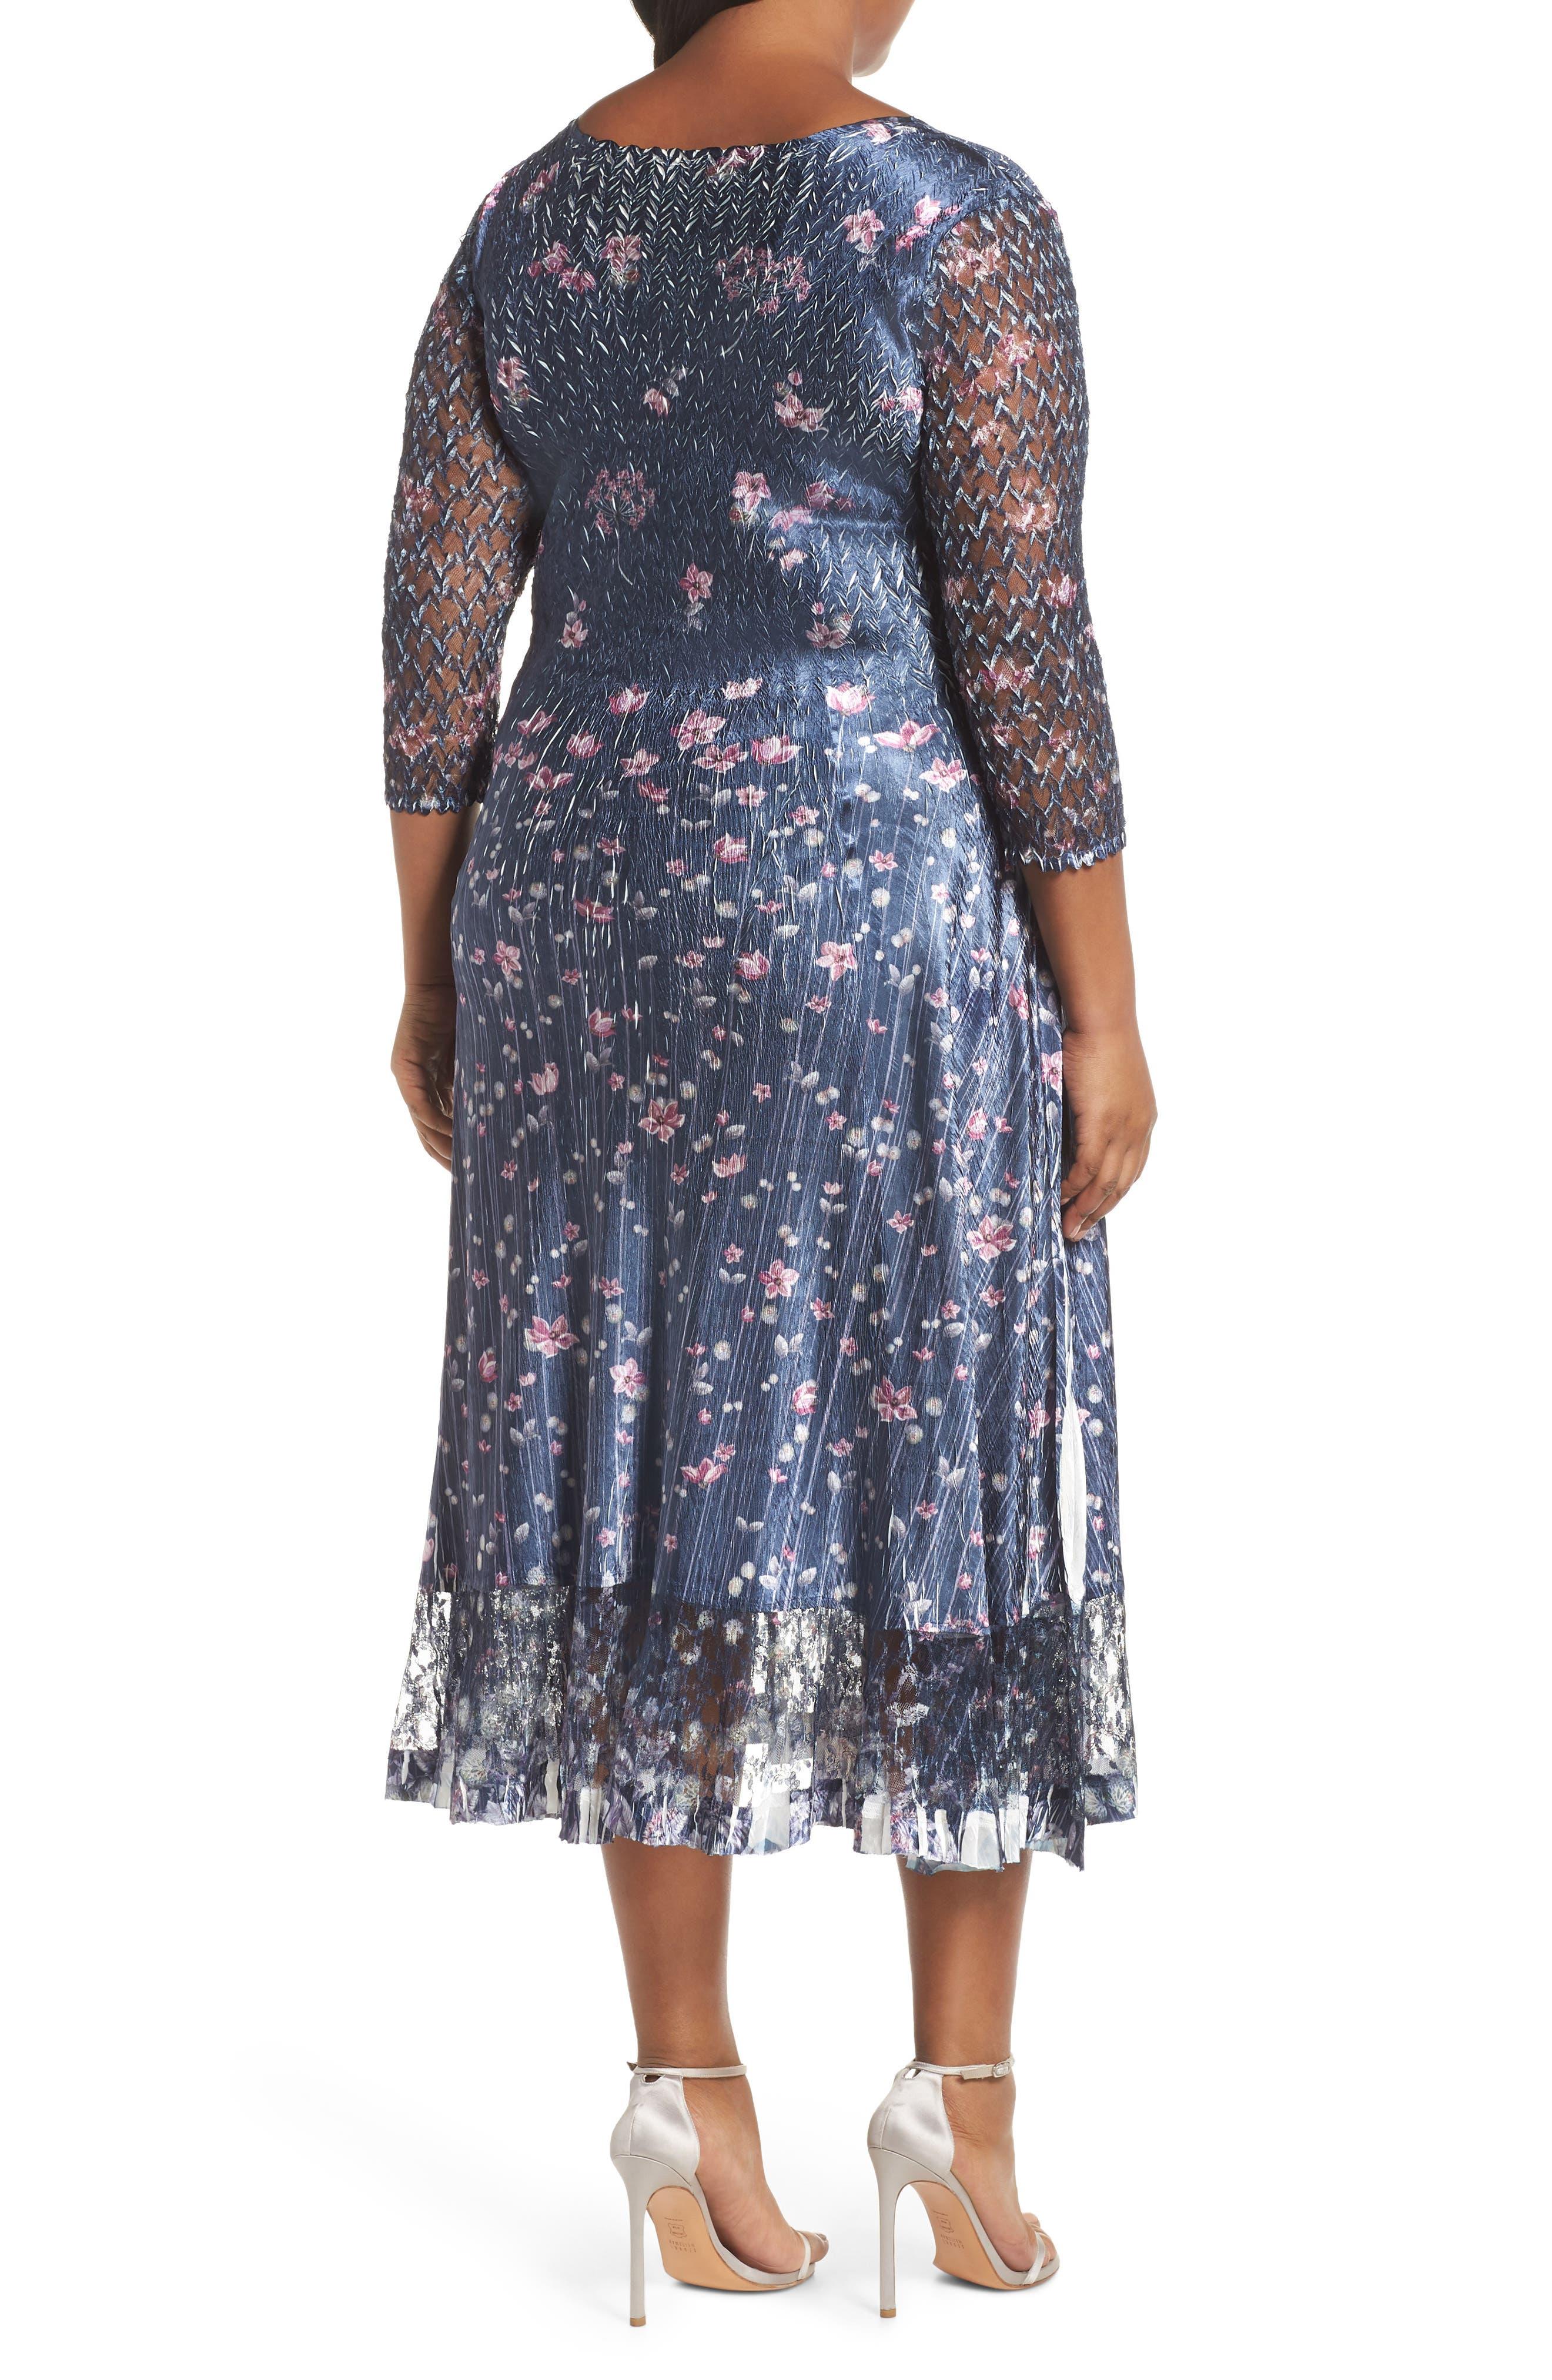 392e93215843 Women s Komarov Dresses